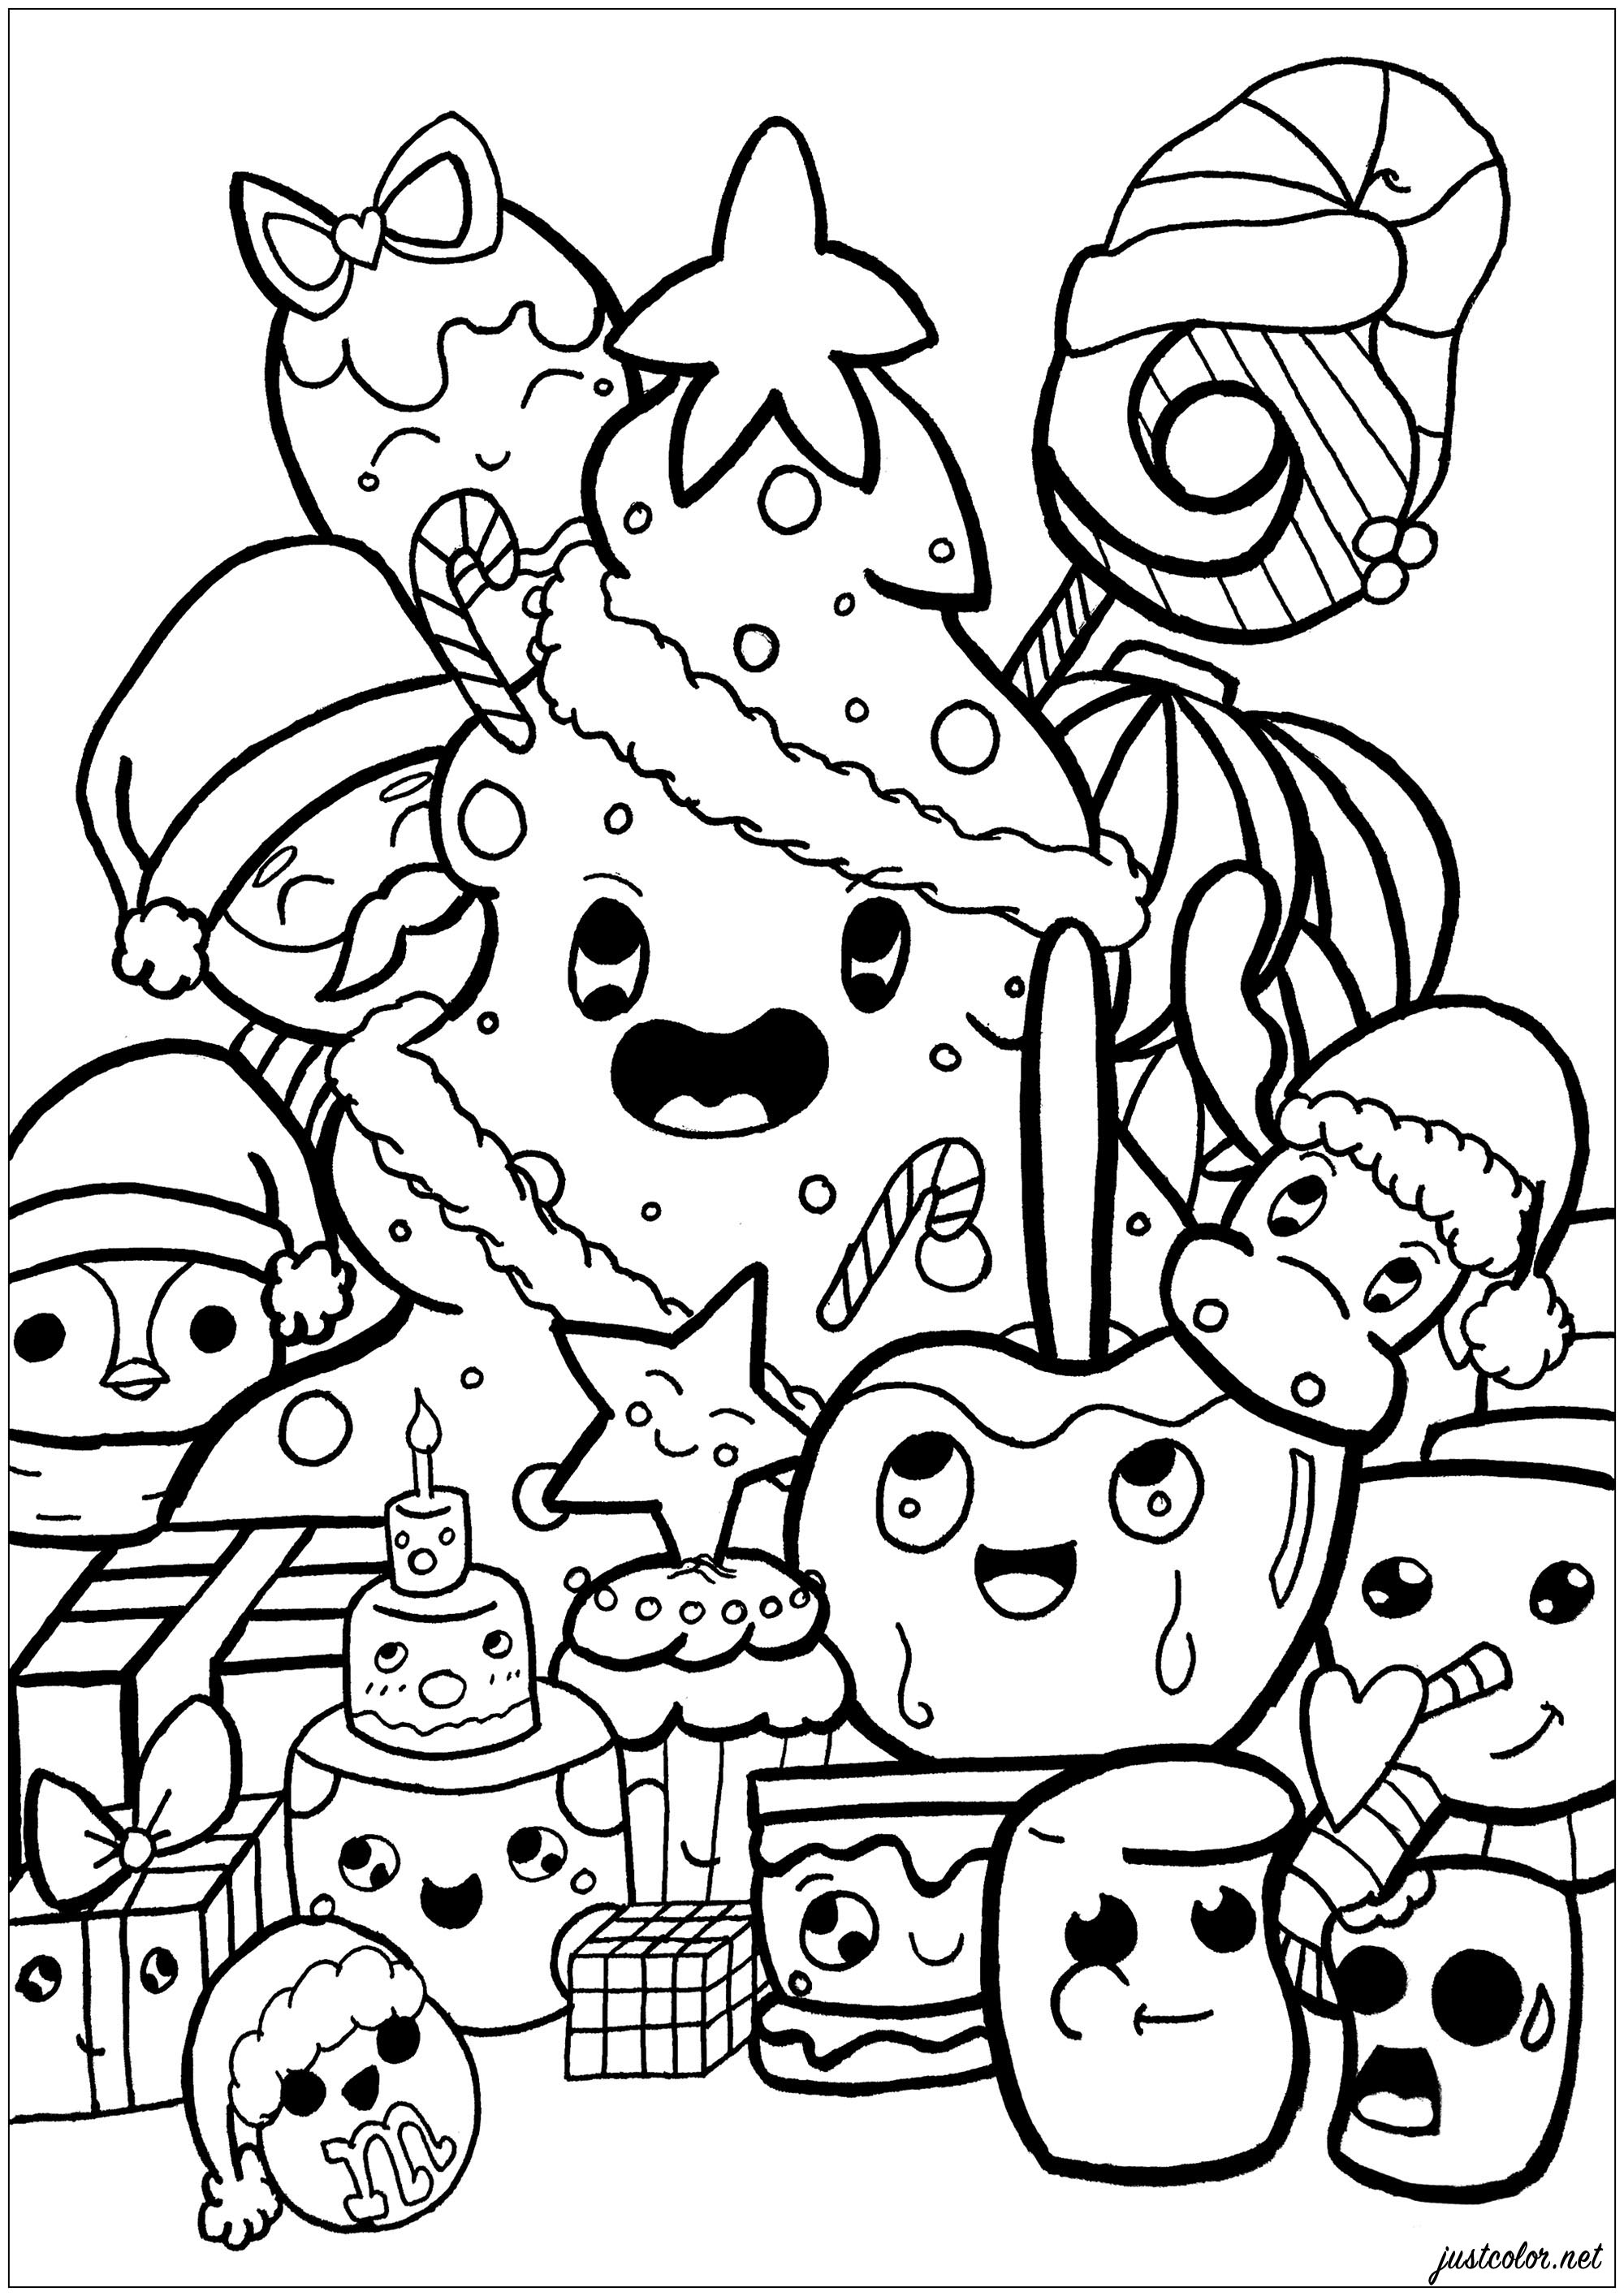 Malbuch Fur Erwachsene : Doodle art / Doodling - 2